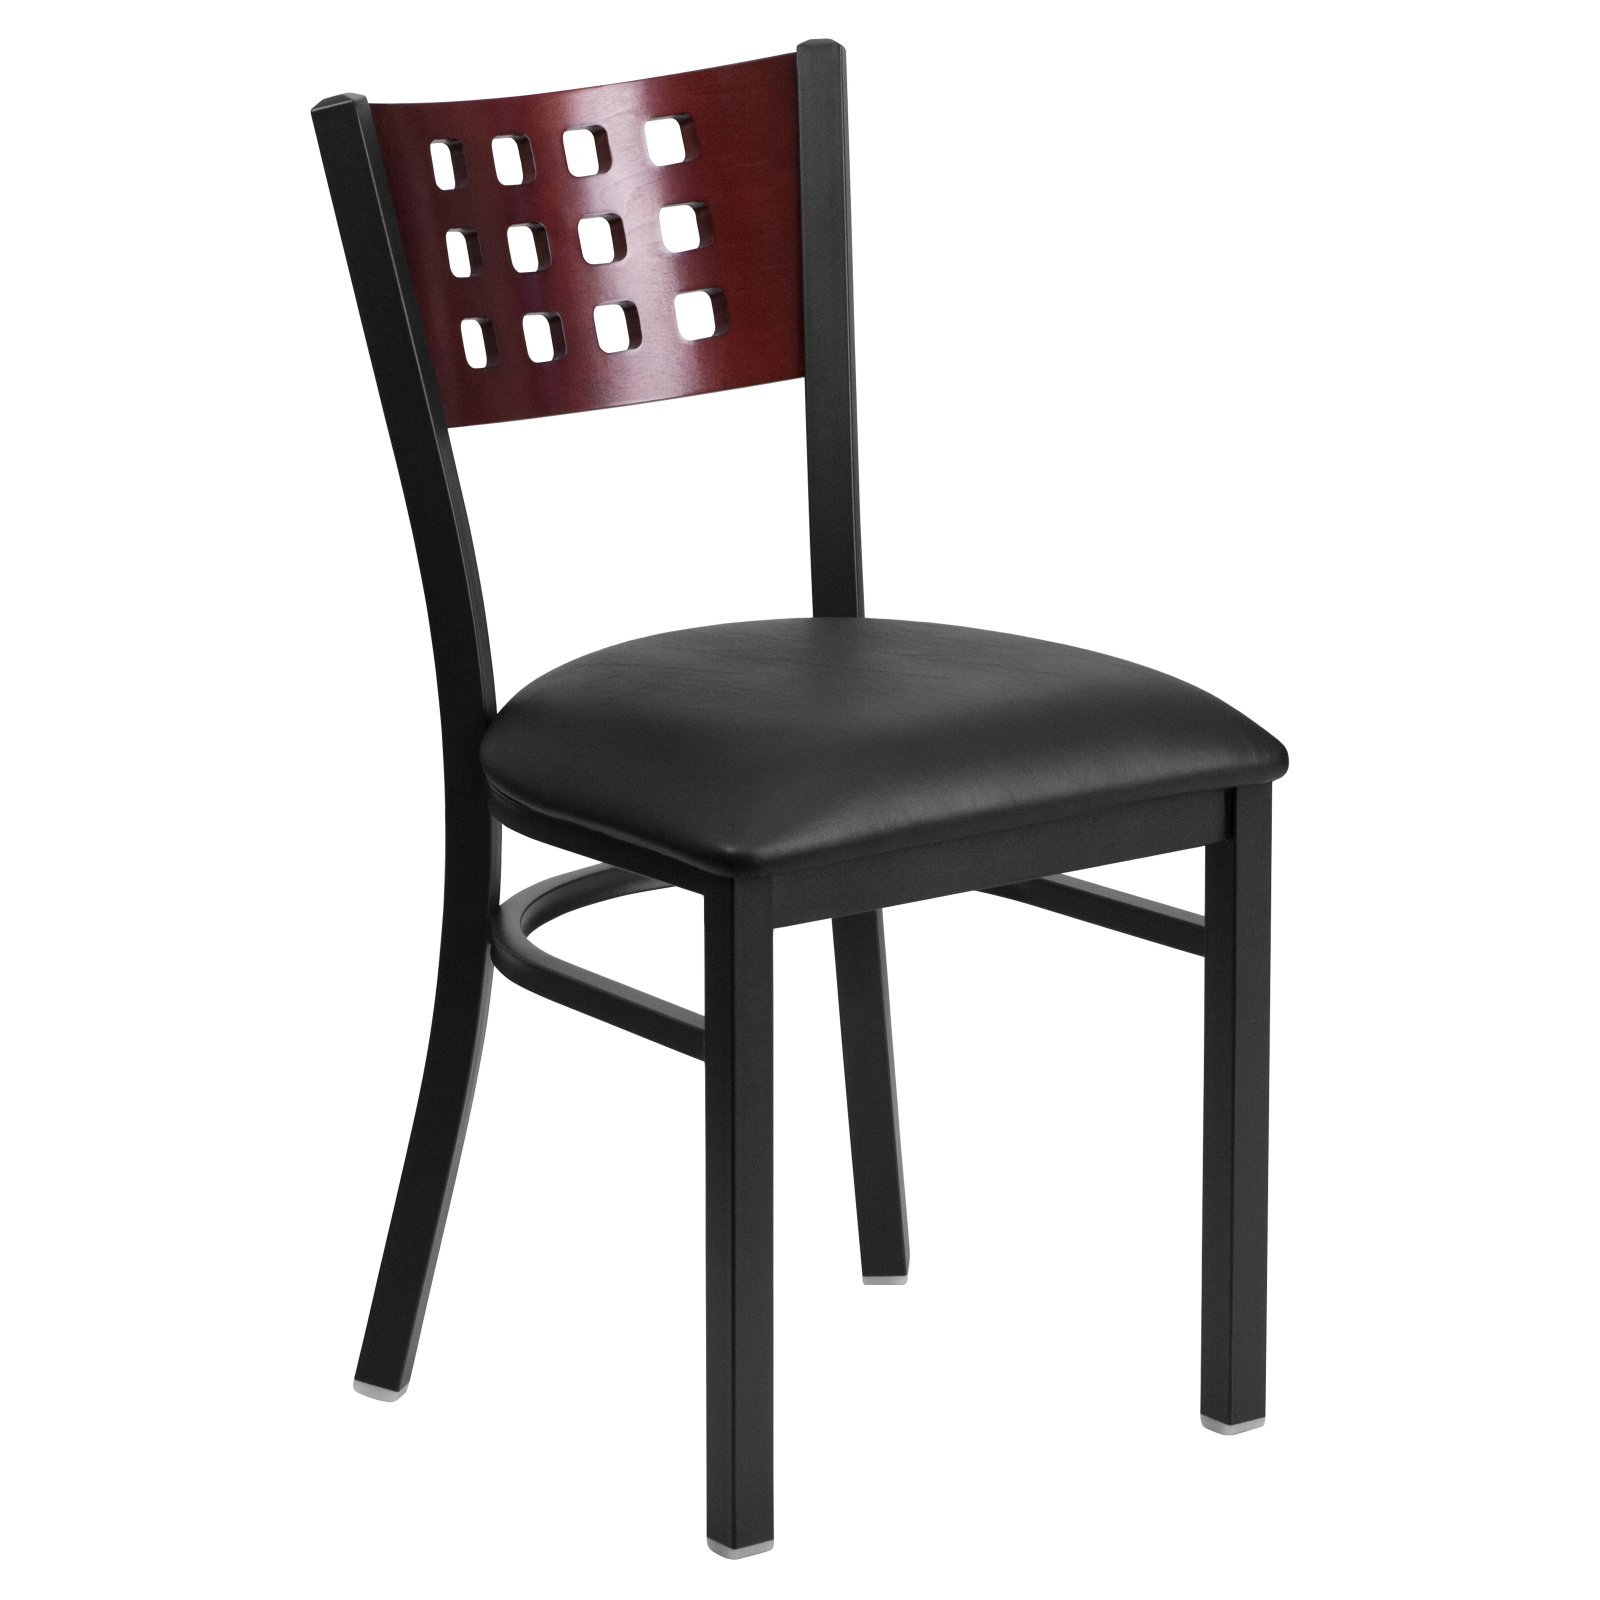 Flash Furniture HERCULES Series Black Decorative Cutout Back Metal Restaurant Chair, Mahogany Wood Back, Vinyl Seat, Multiple Colors